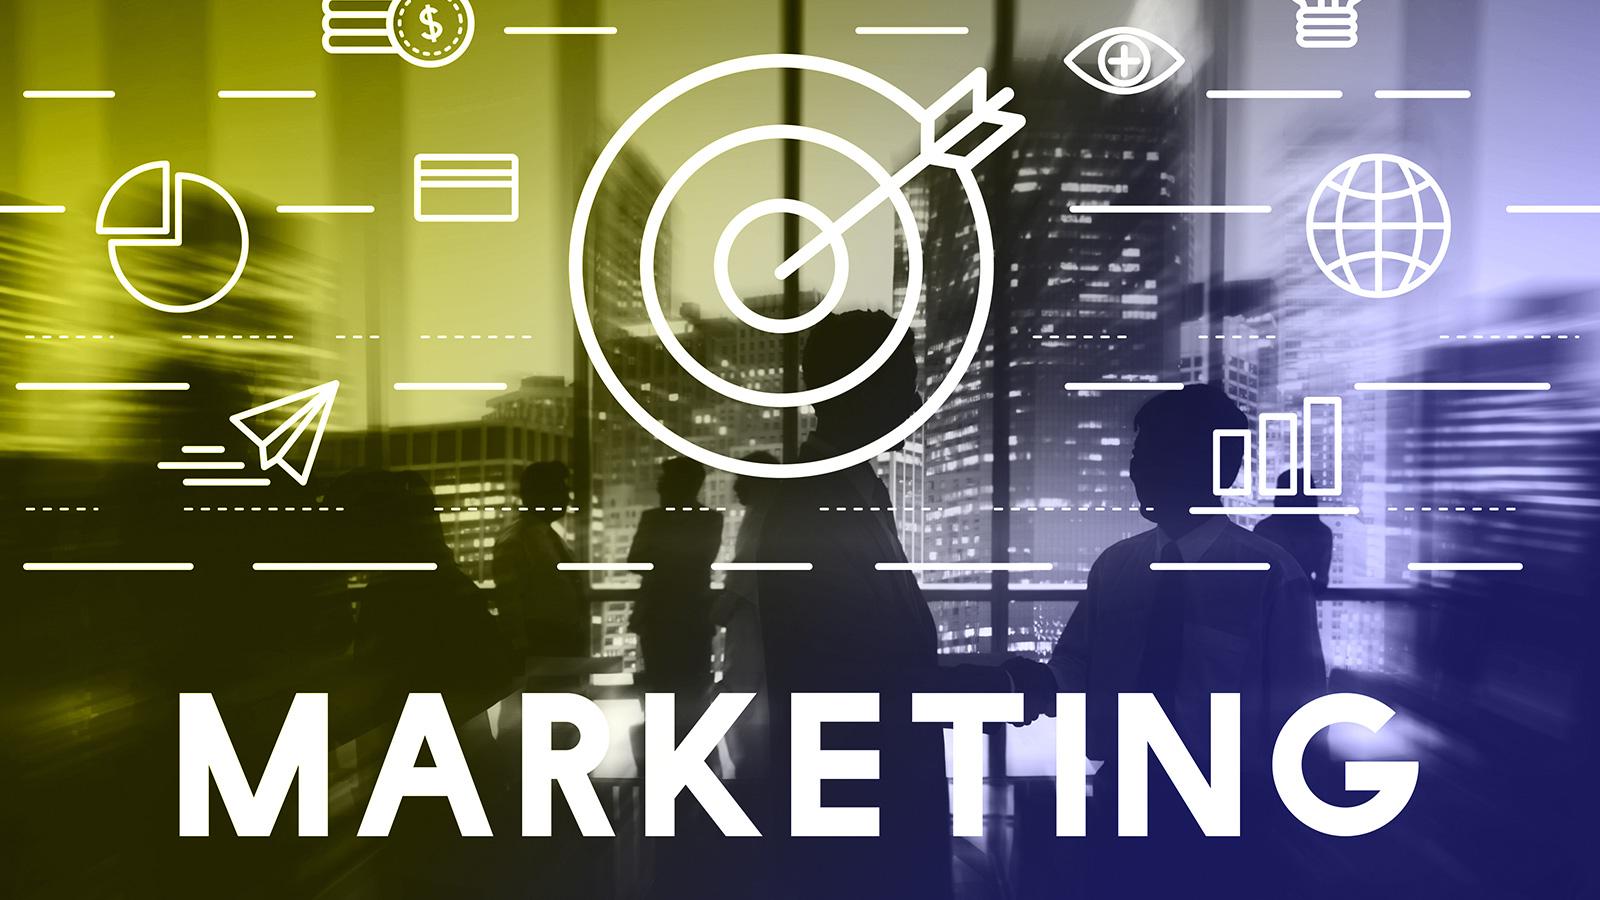 Top range marketing agencies in Singapore